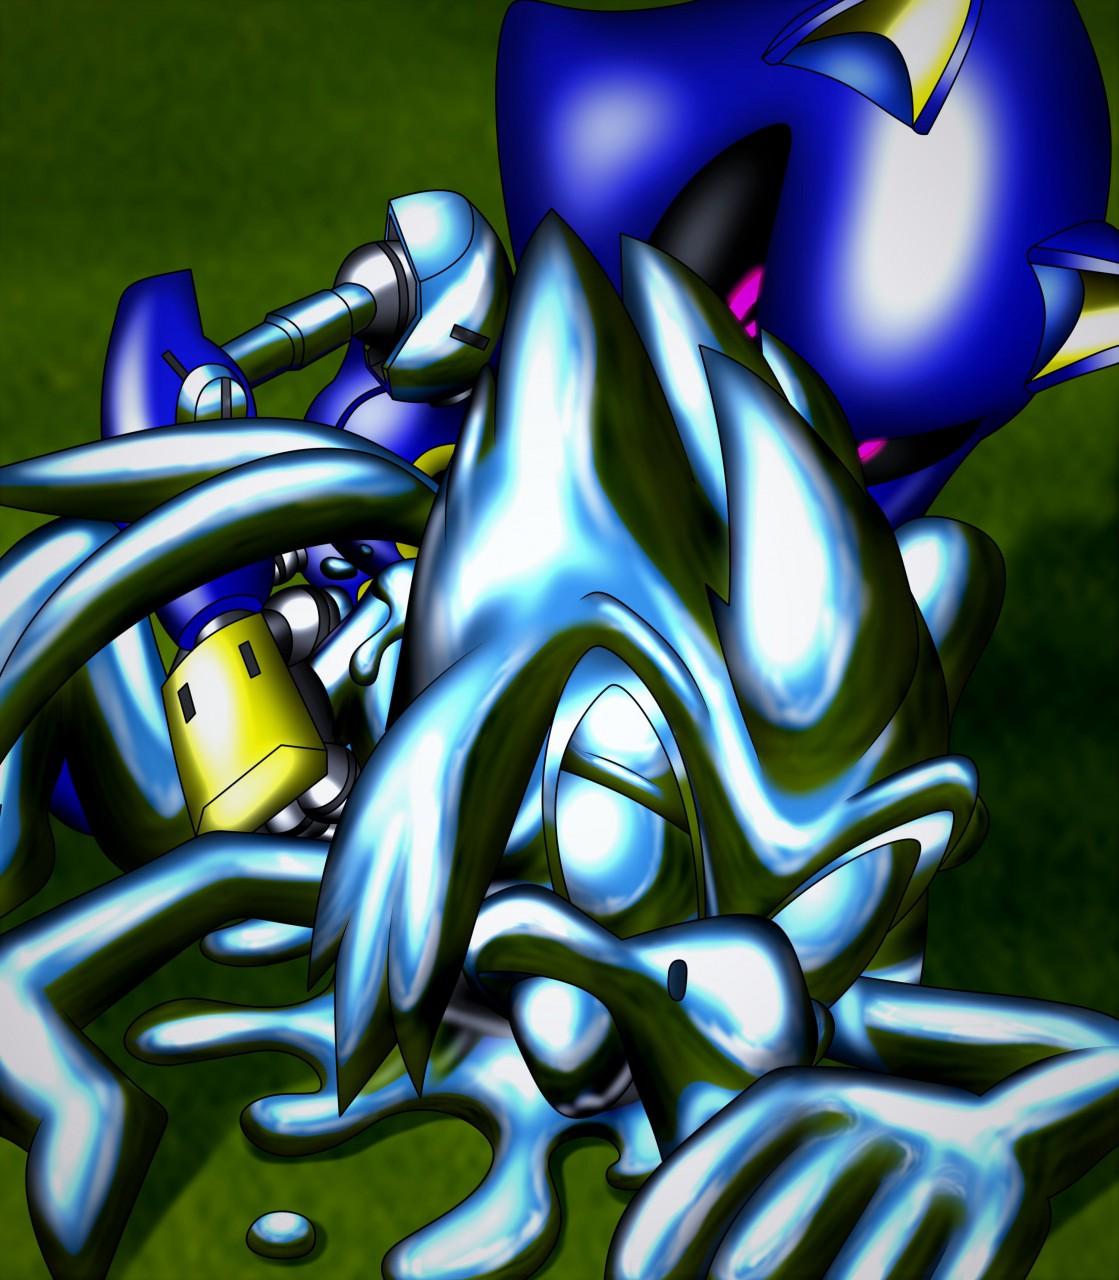 sonic transformed ctrl-z 3 Spark the electric jester 2